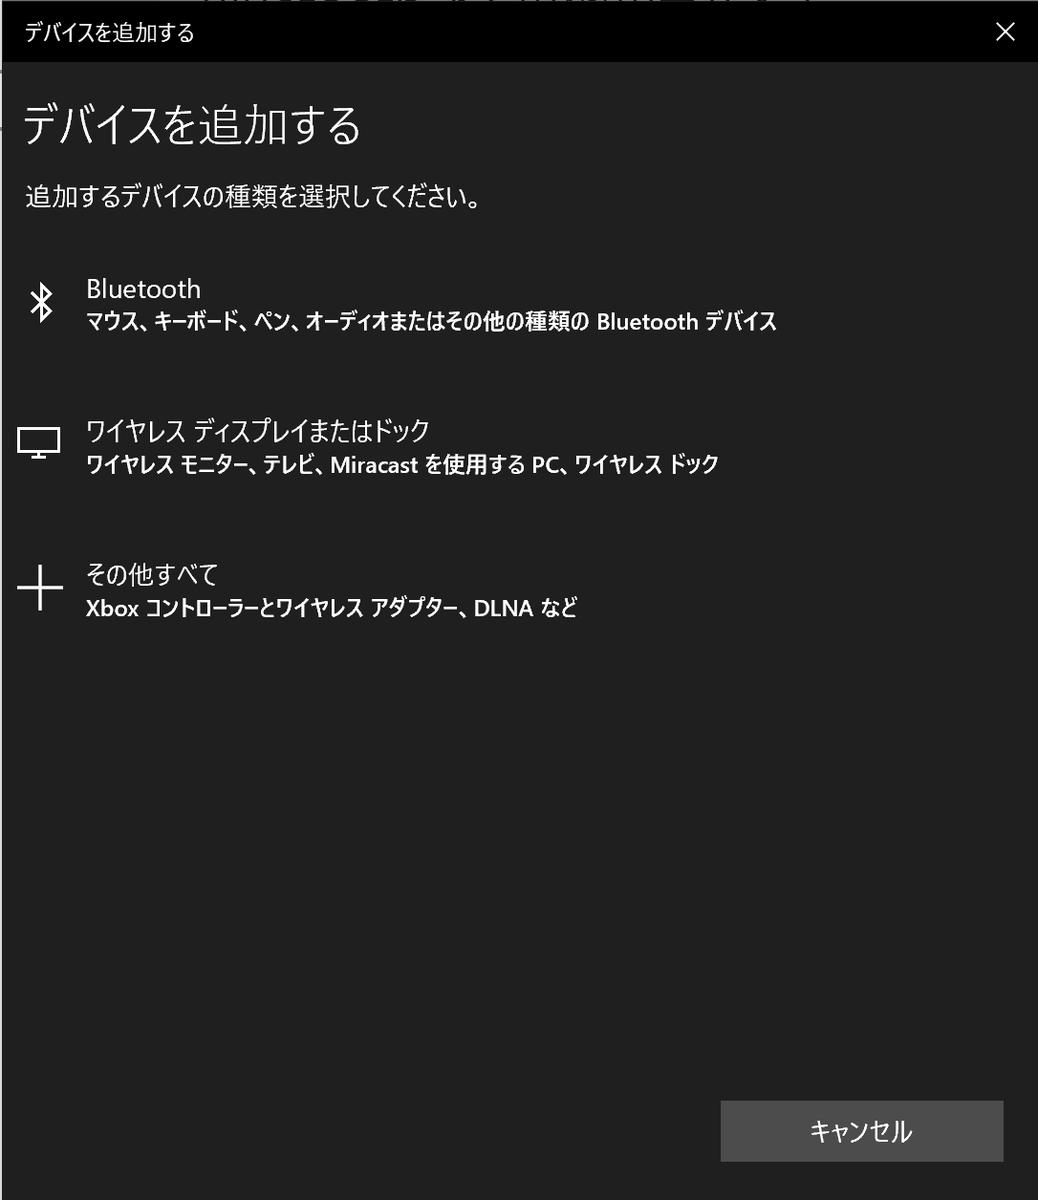 f:id:opensourcetech:20200115221645p:plain